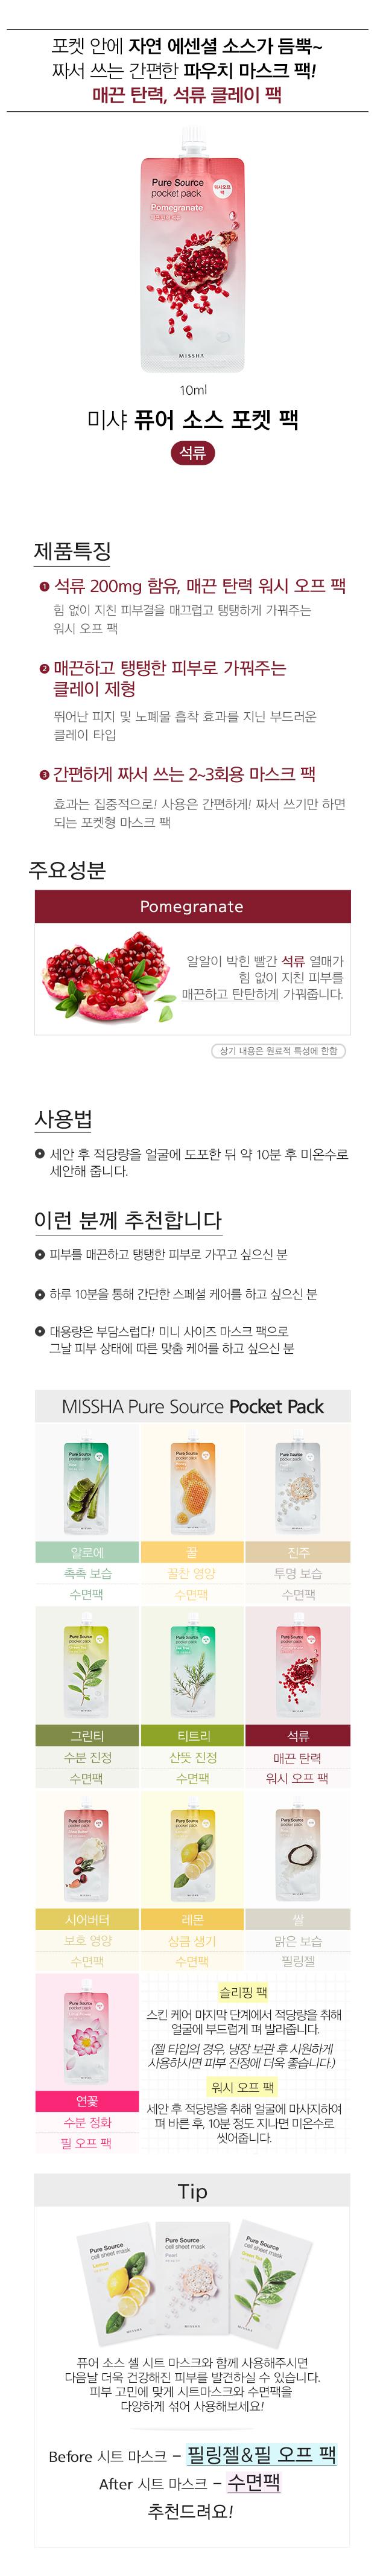 MISSHA Pocket Pack - Sleeping Pack